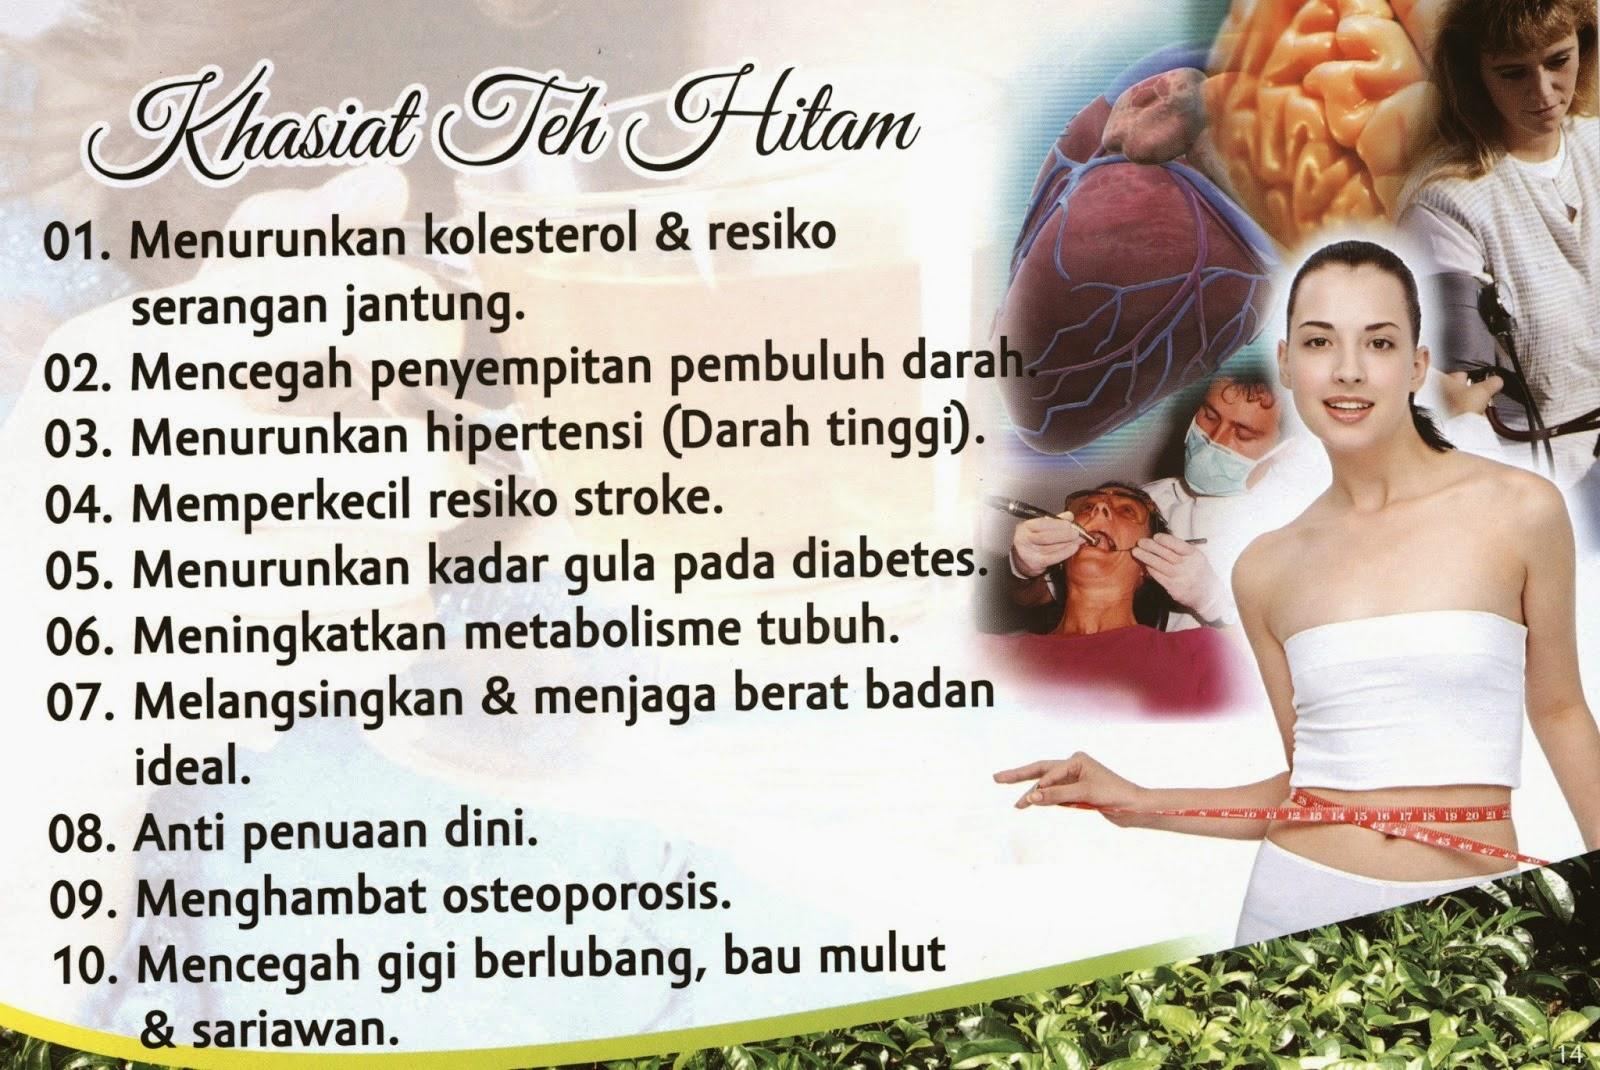 Obat Pelangsing Herbal Alami Fitslim Herbal – Terdaftar BPOM